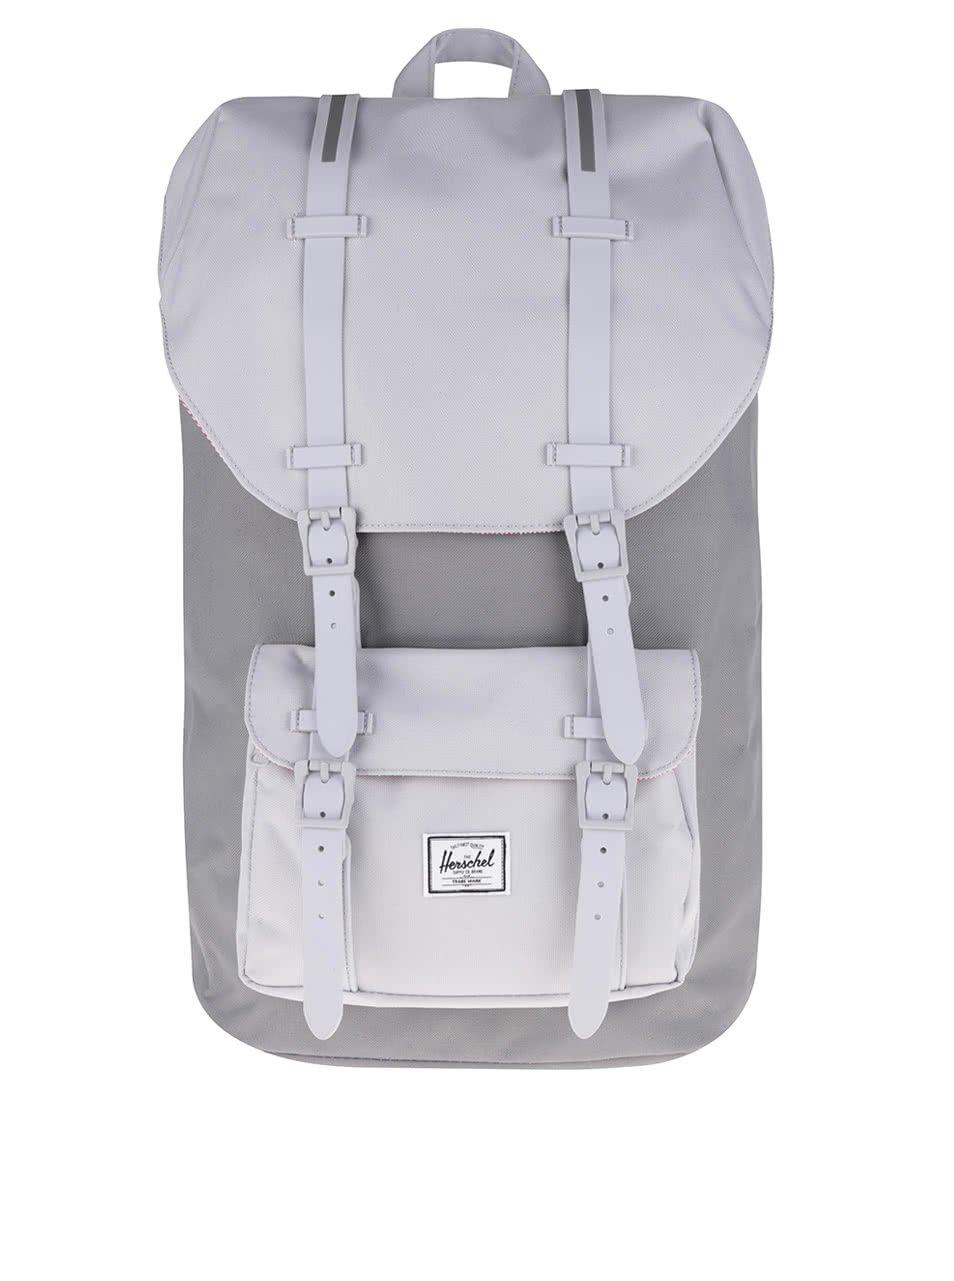 Šedý batoh s šedými popruhy Herschel Little America 25 l